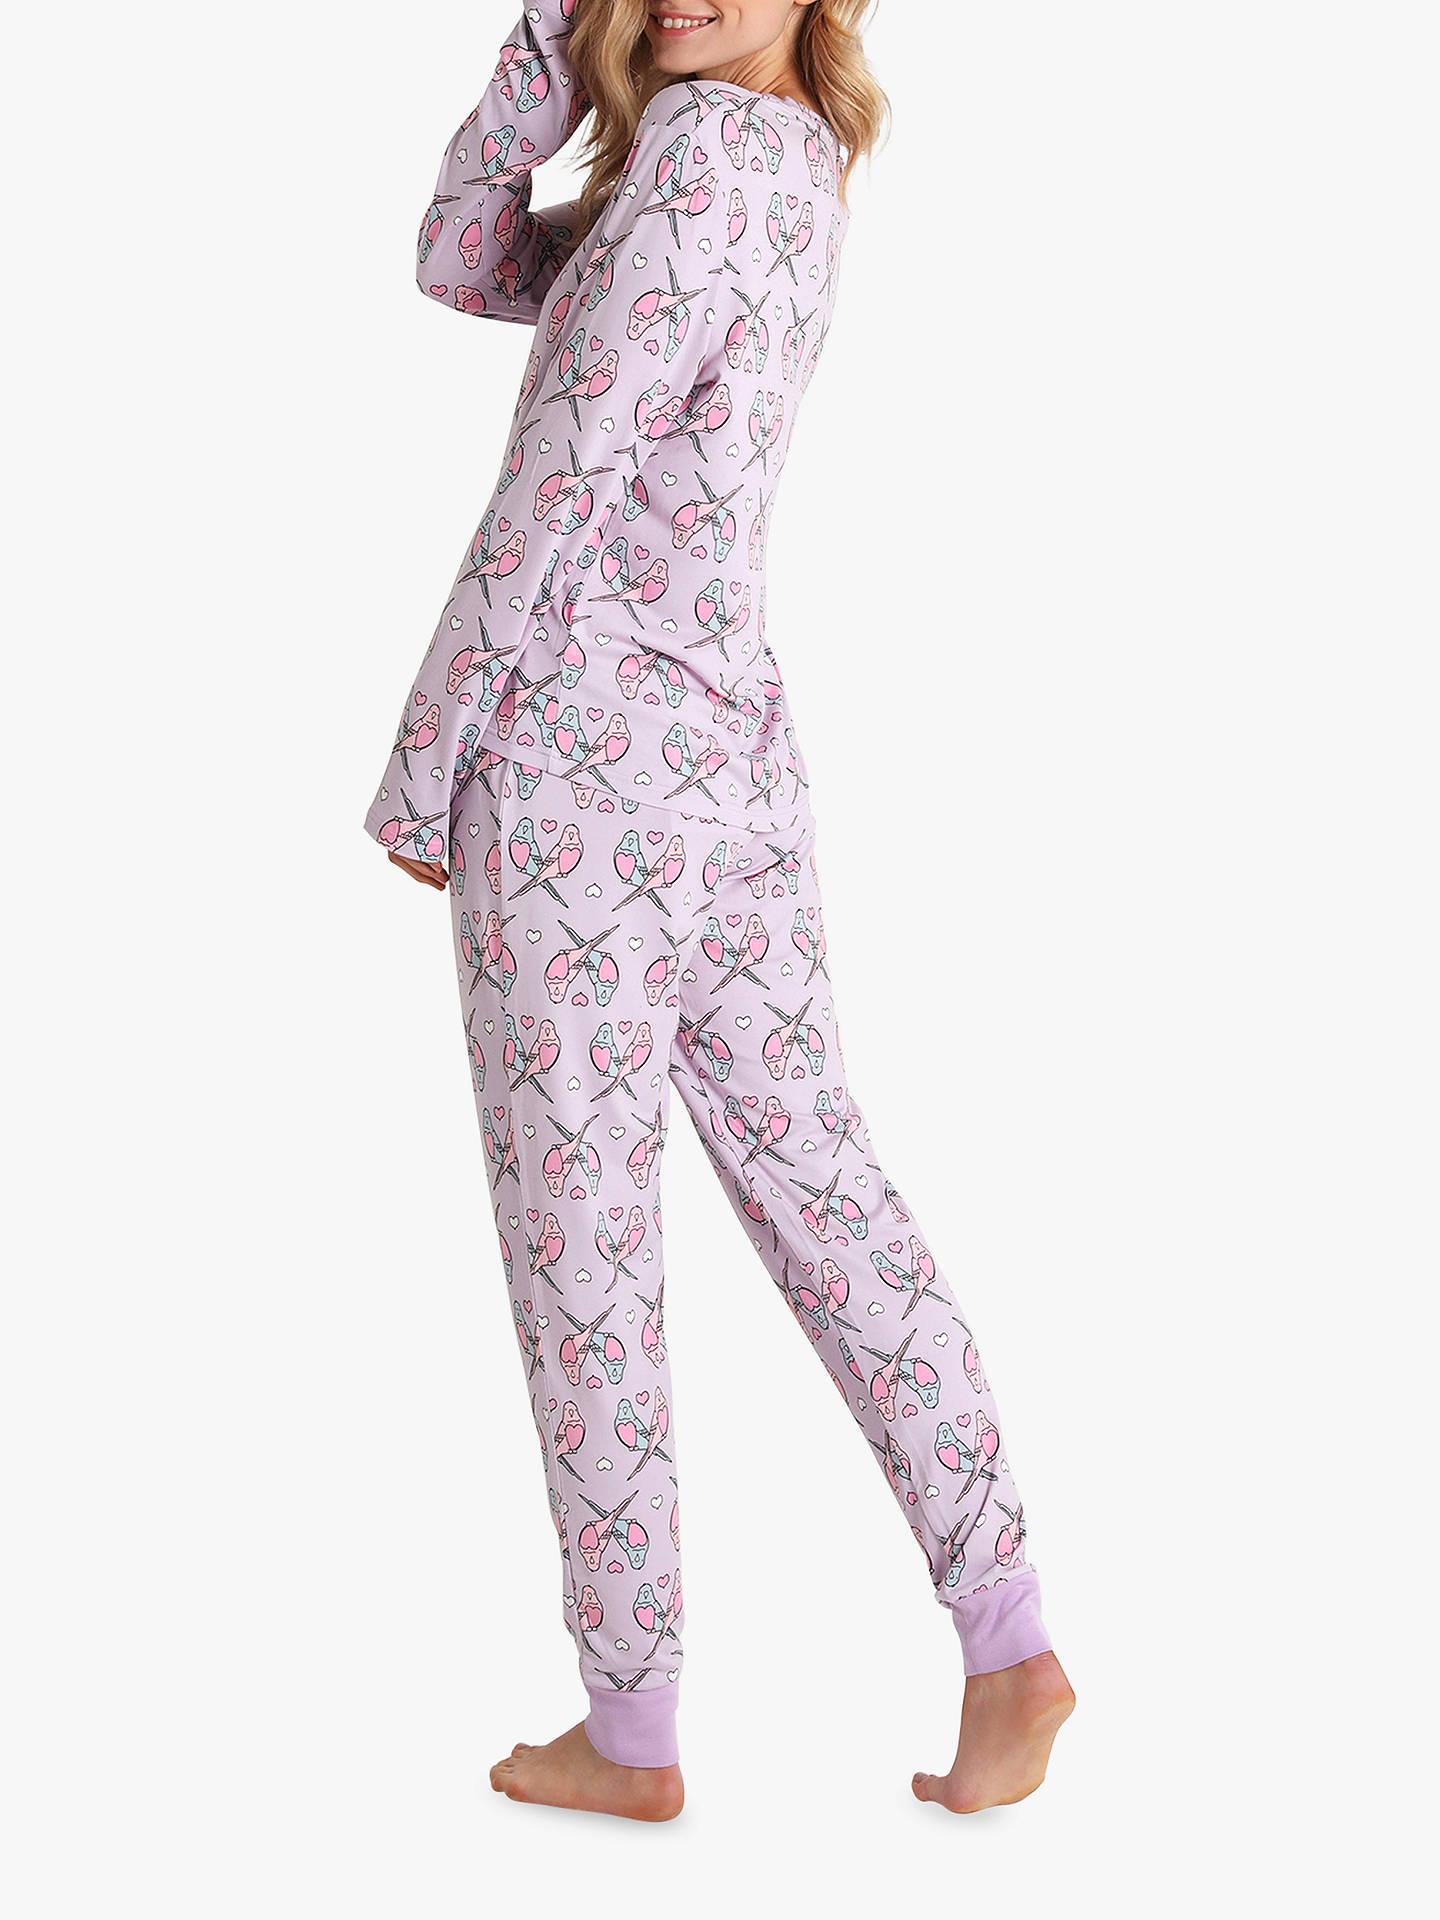 Chelsea Peers Love Budgie Pyjama Set, Lilac at John Lewis